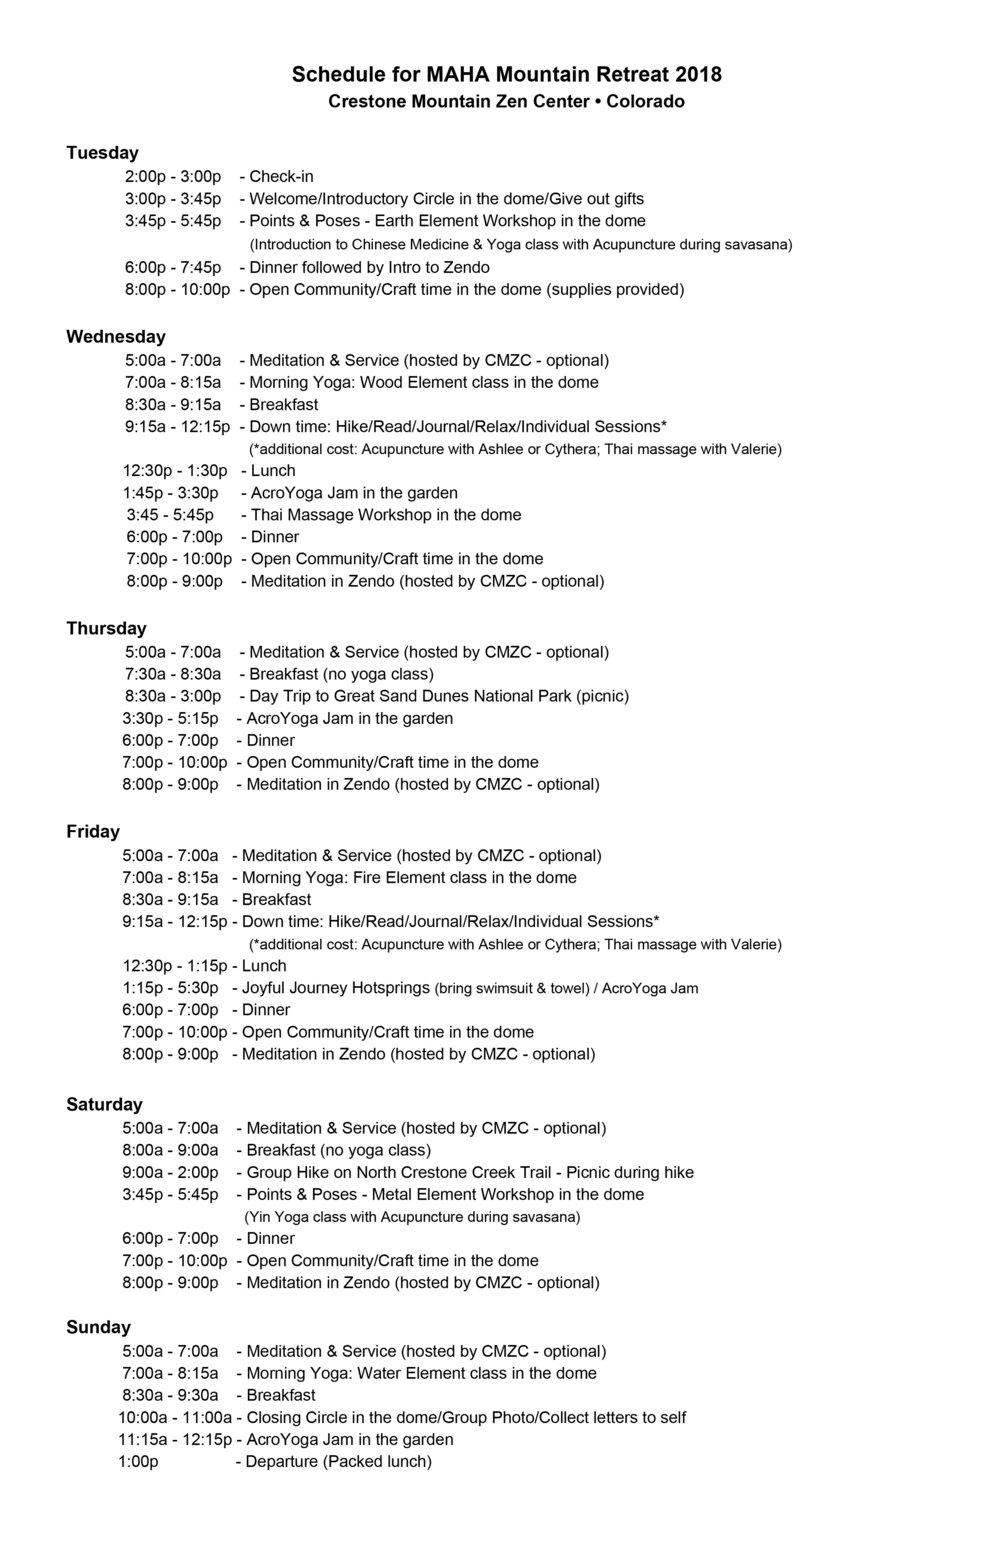 Schedule for MAHA Mountain Retreat - 2018.jpg